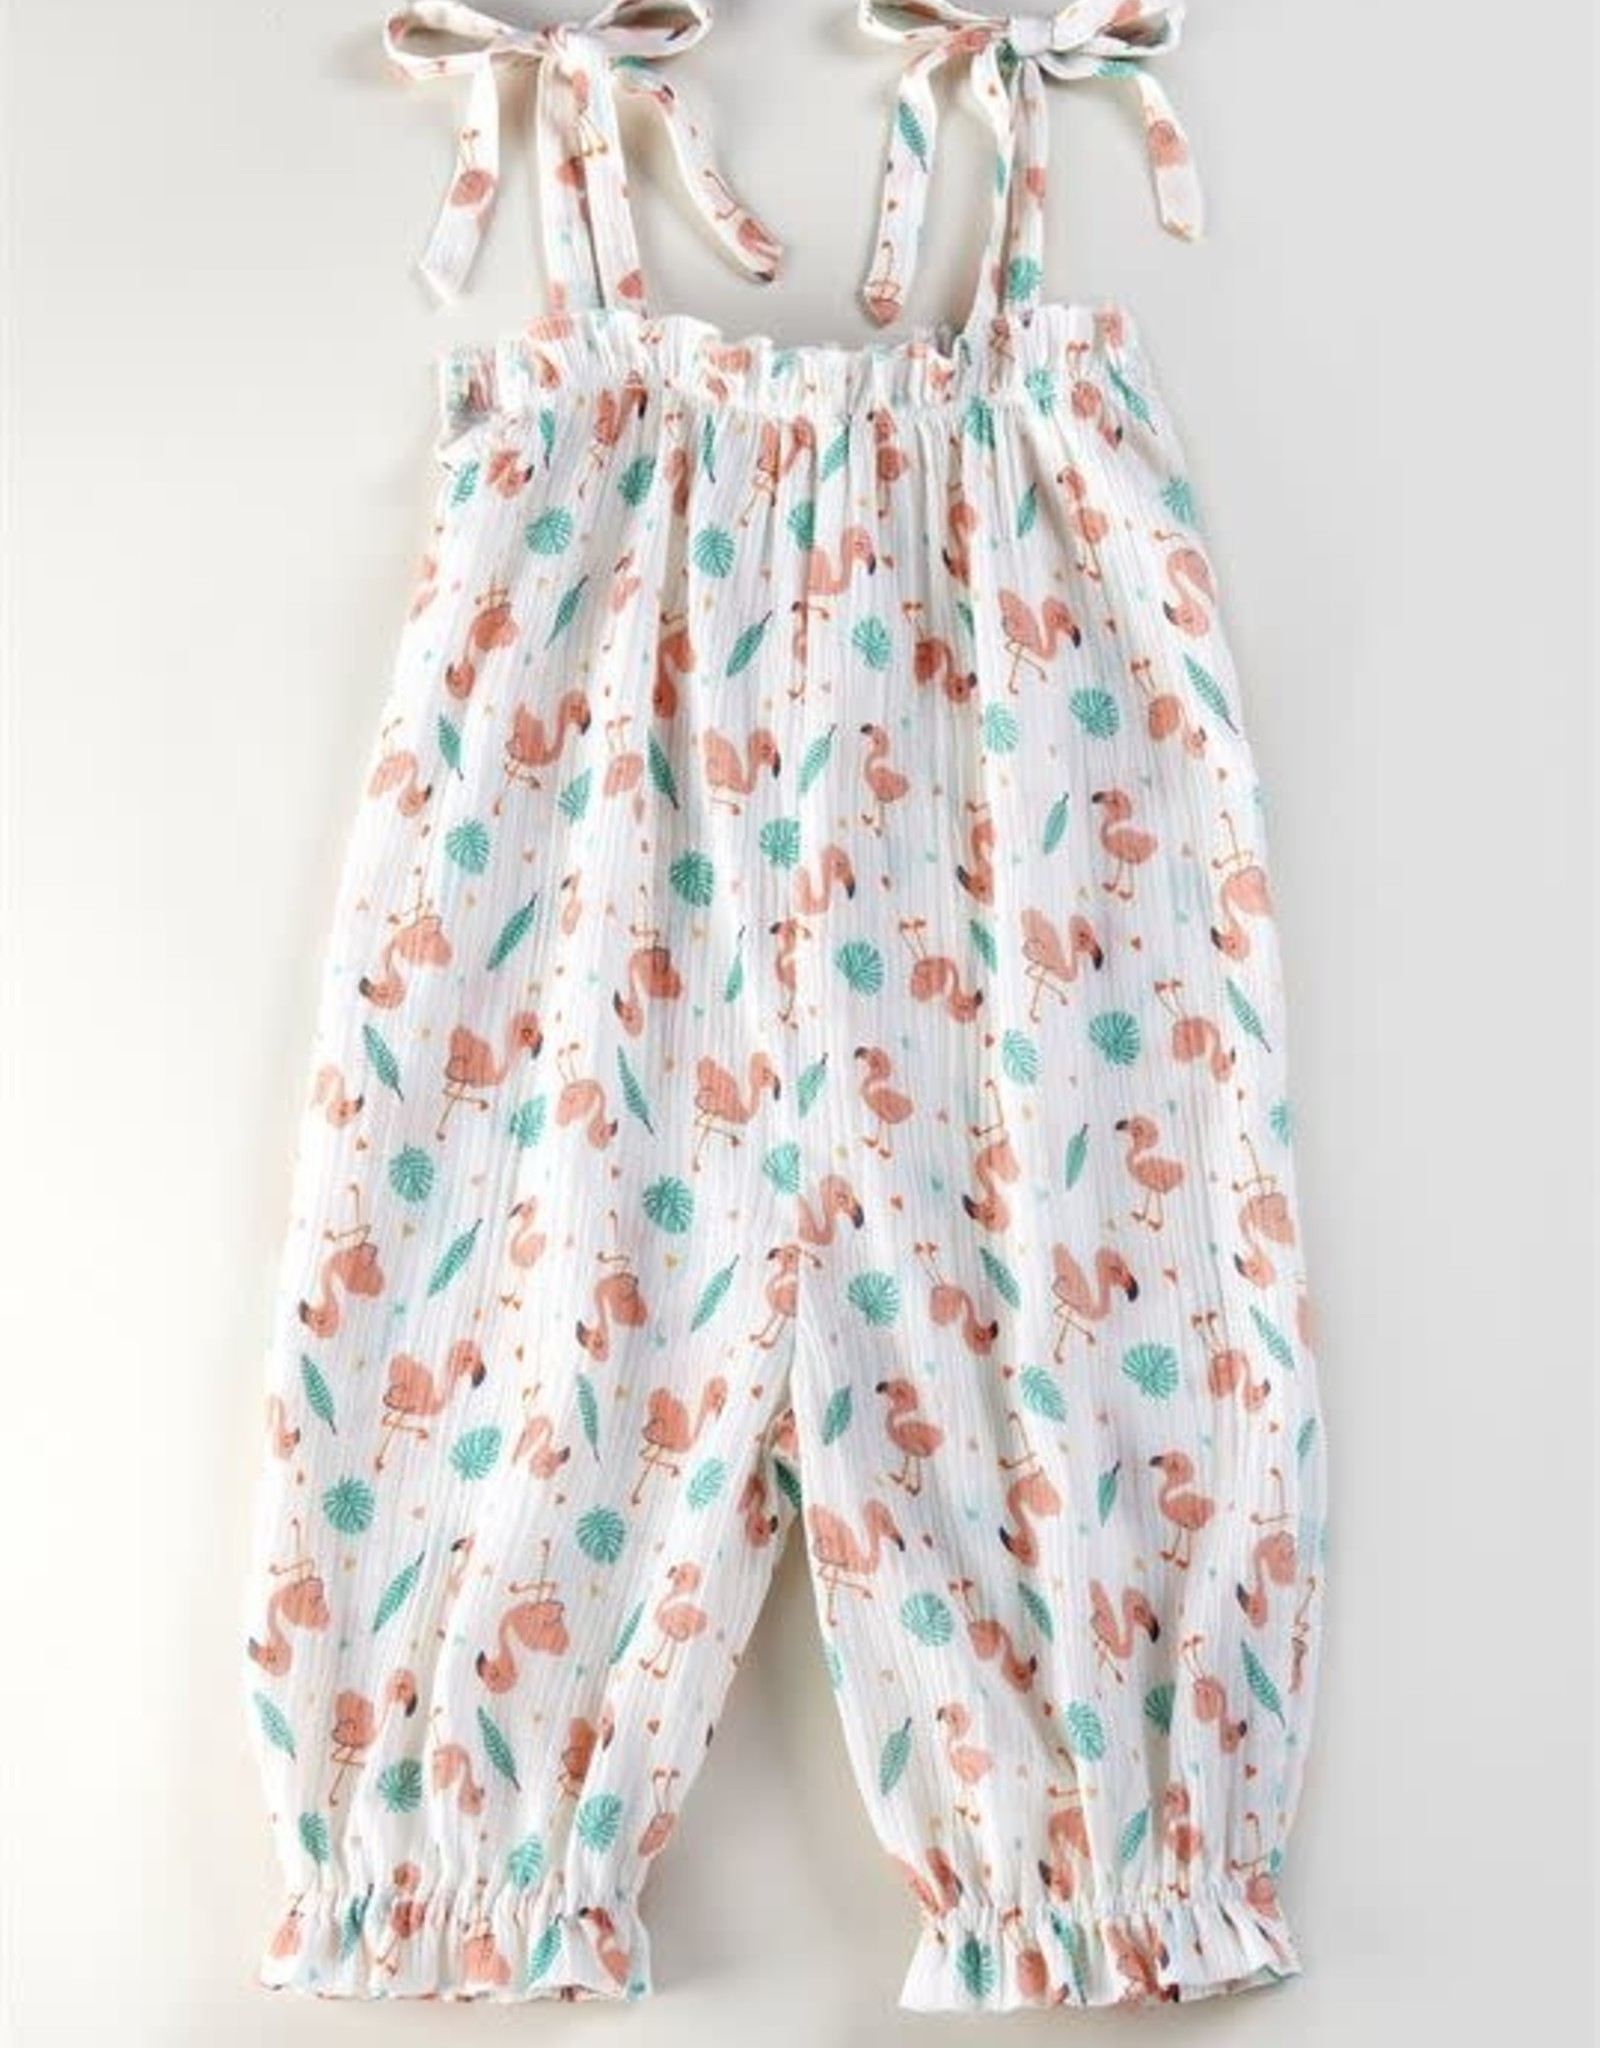 Cartwheels Infant Romper